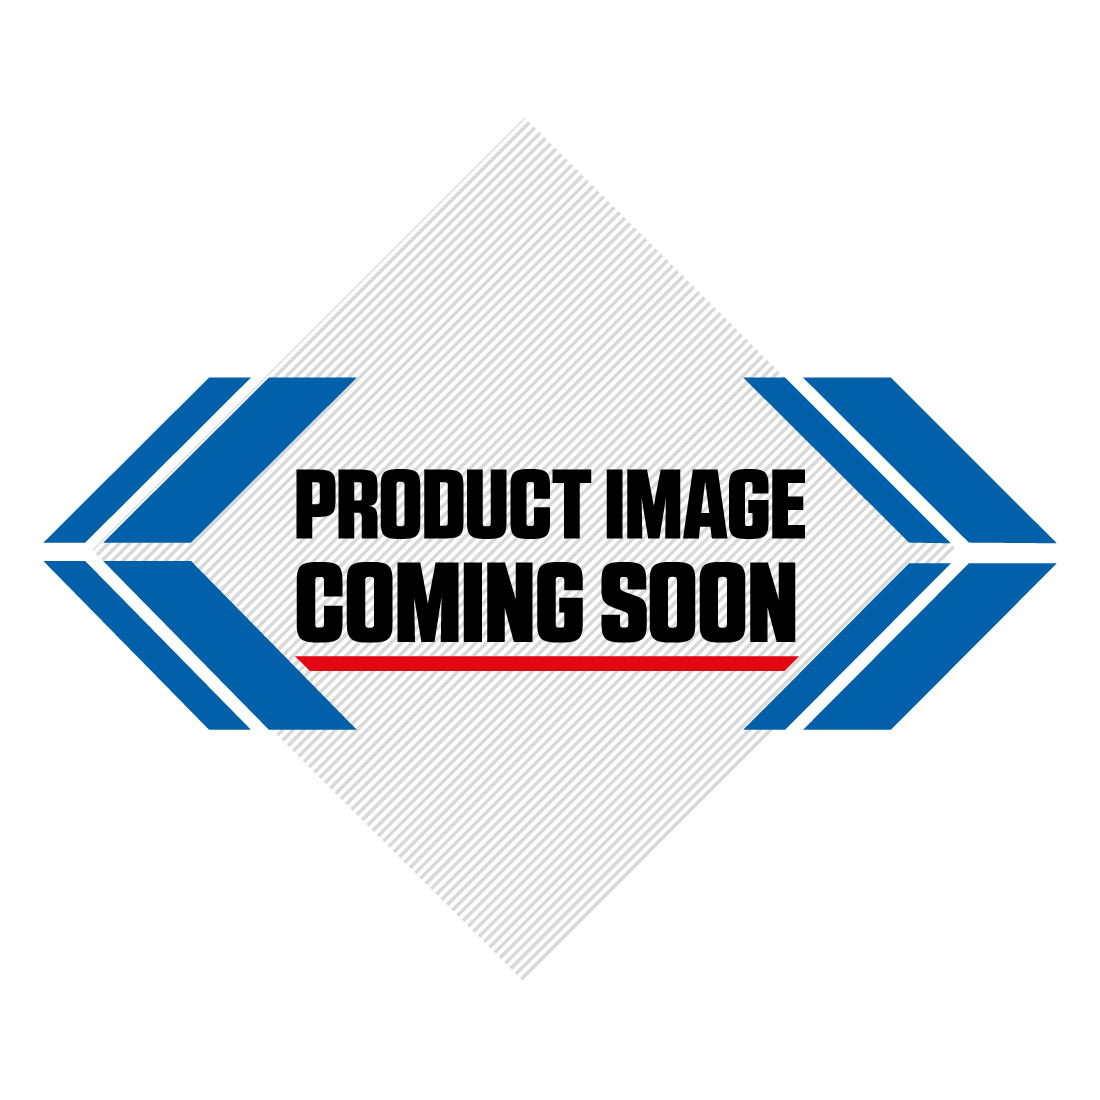 Renthal Twinring Rear Sprocket KTM SX SX-F EXC EXC-F Husqvarna TC FC TE FE - Black Image-1>